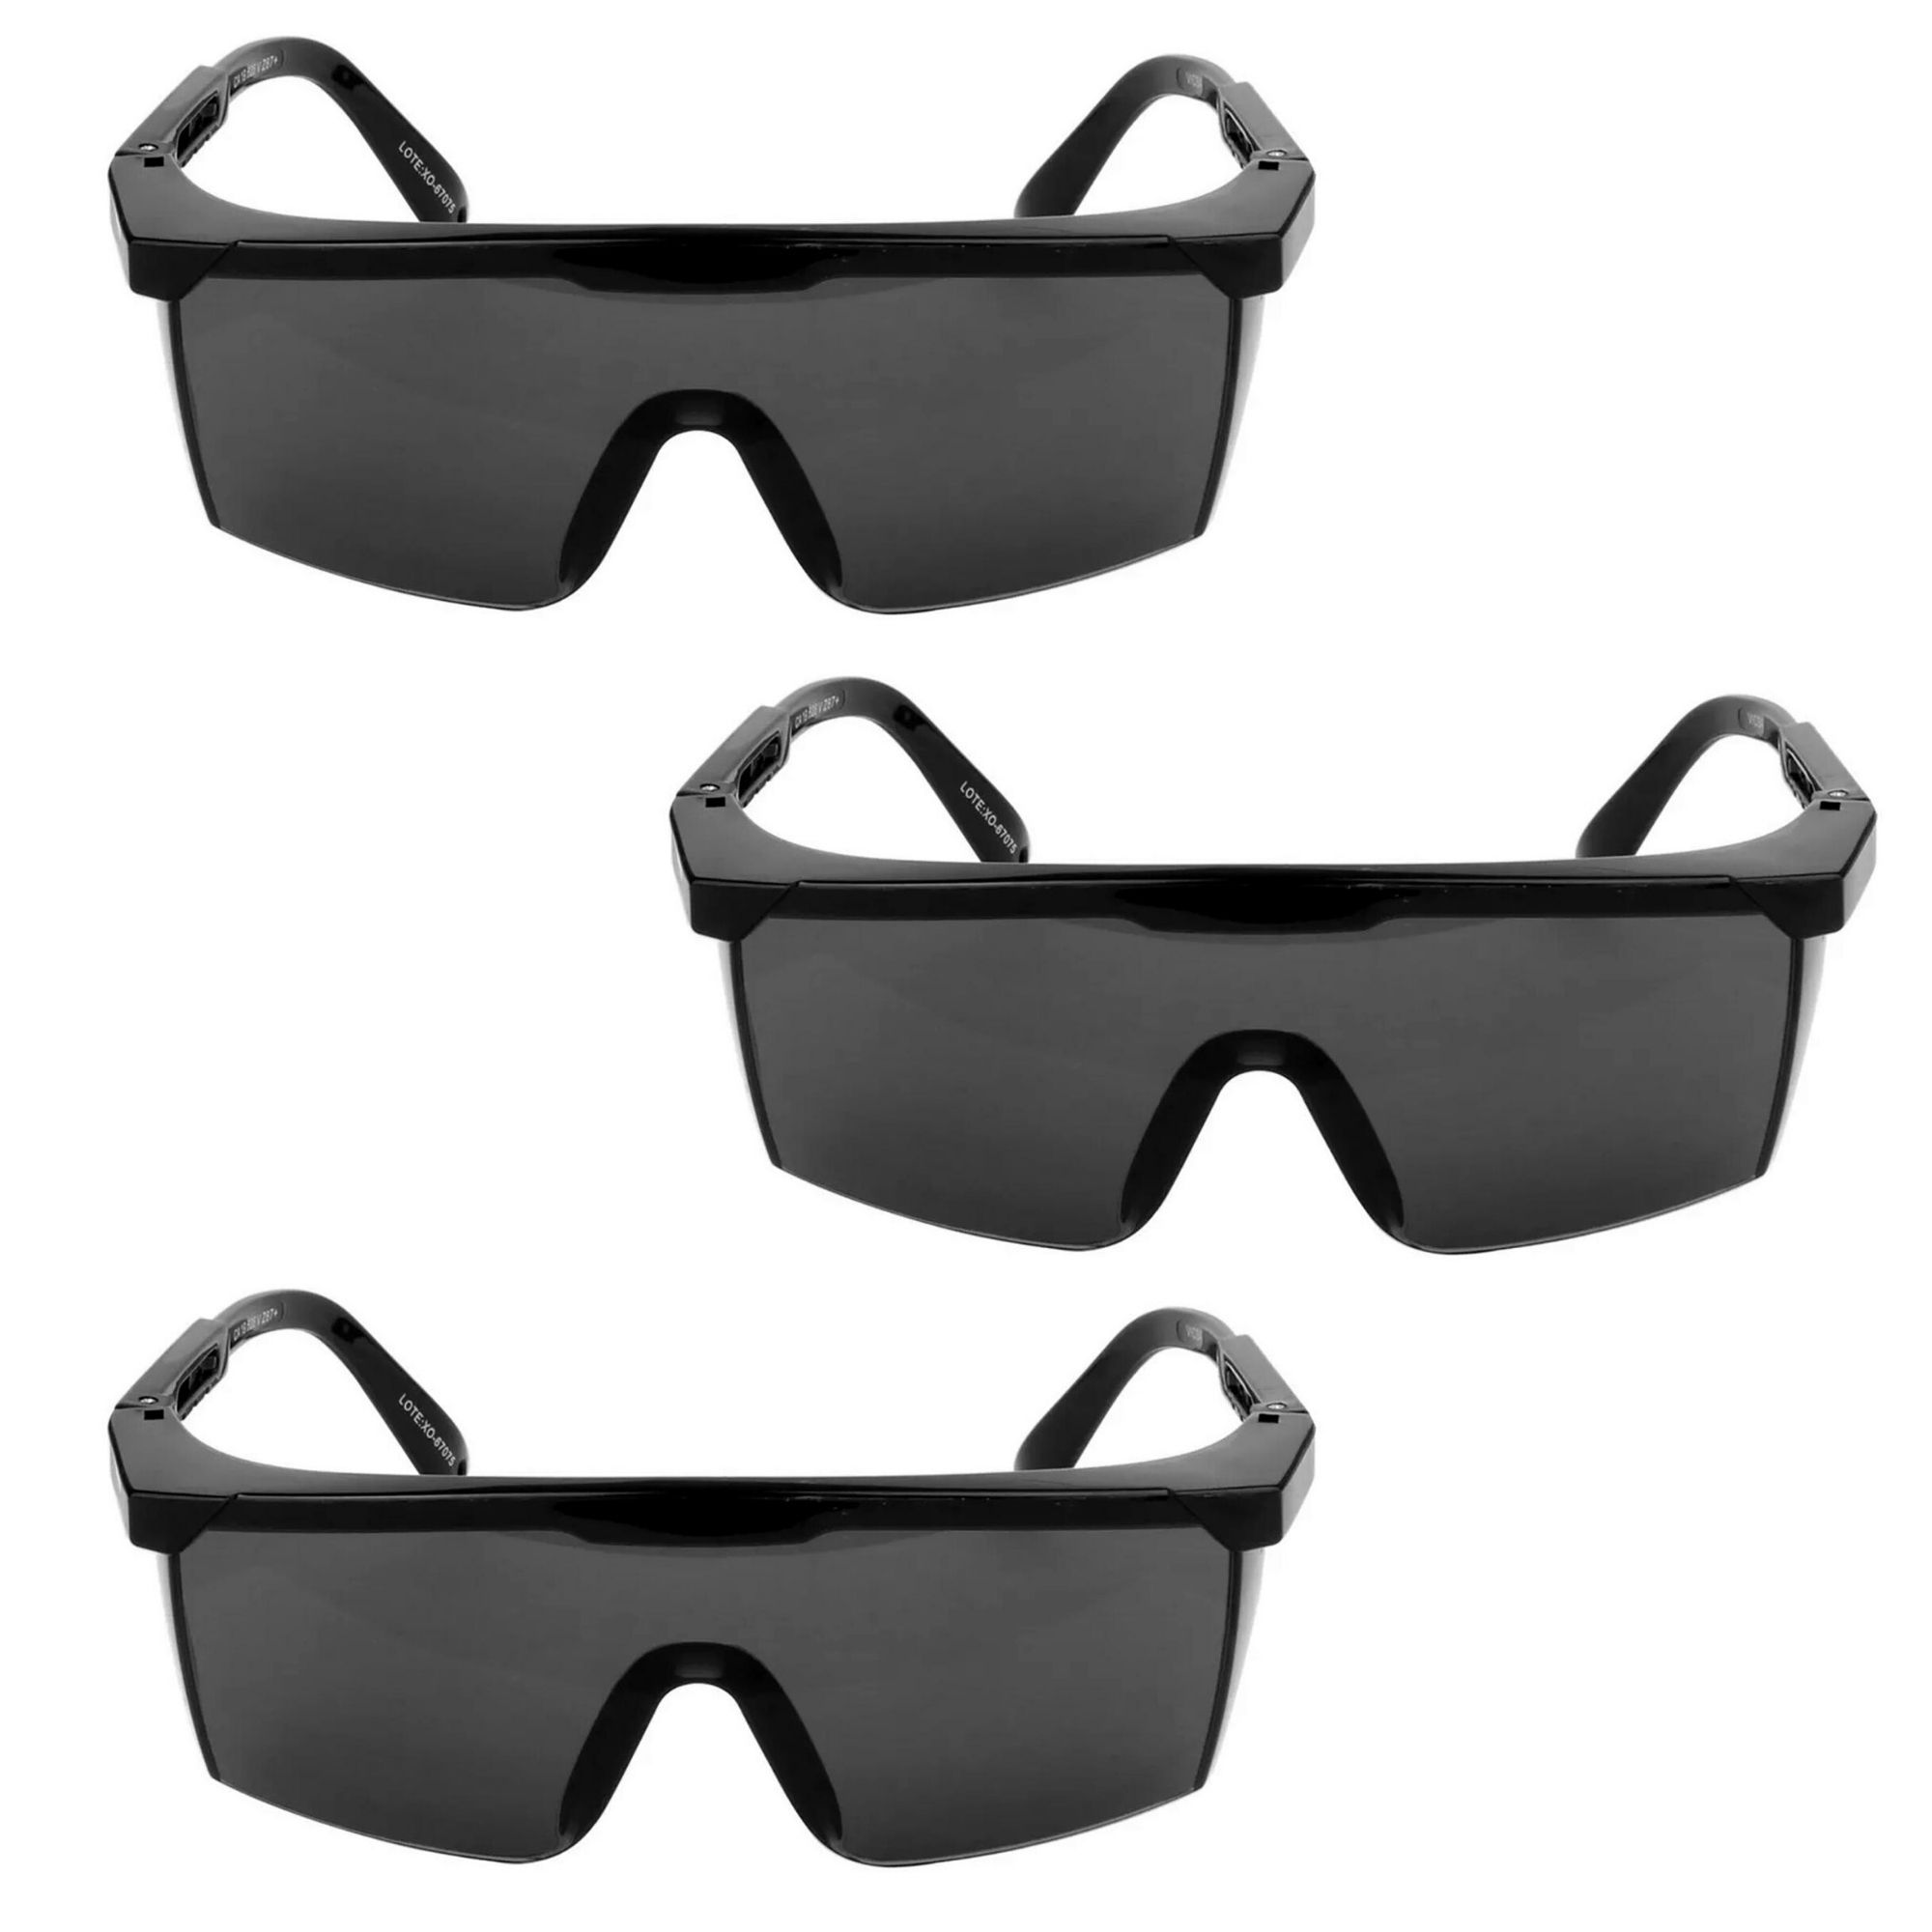 Kit De 3 Peças De Oculos Seguranca Nitro -- Rj Vicsa Cinza  - DE PAULA EPI